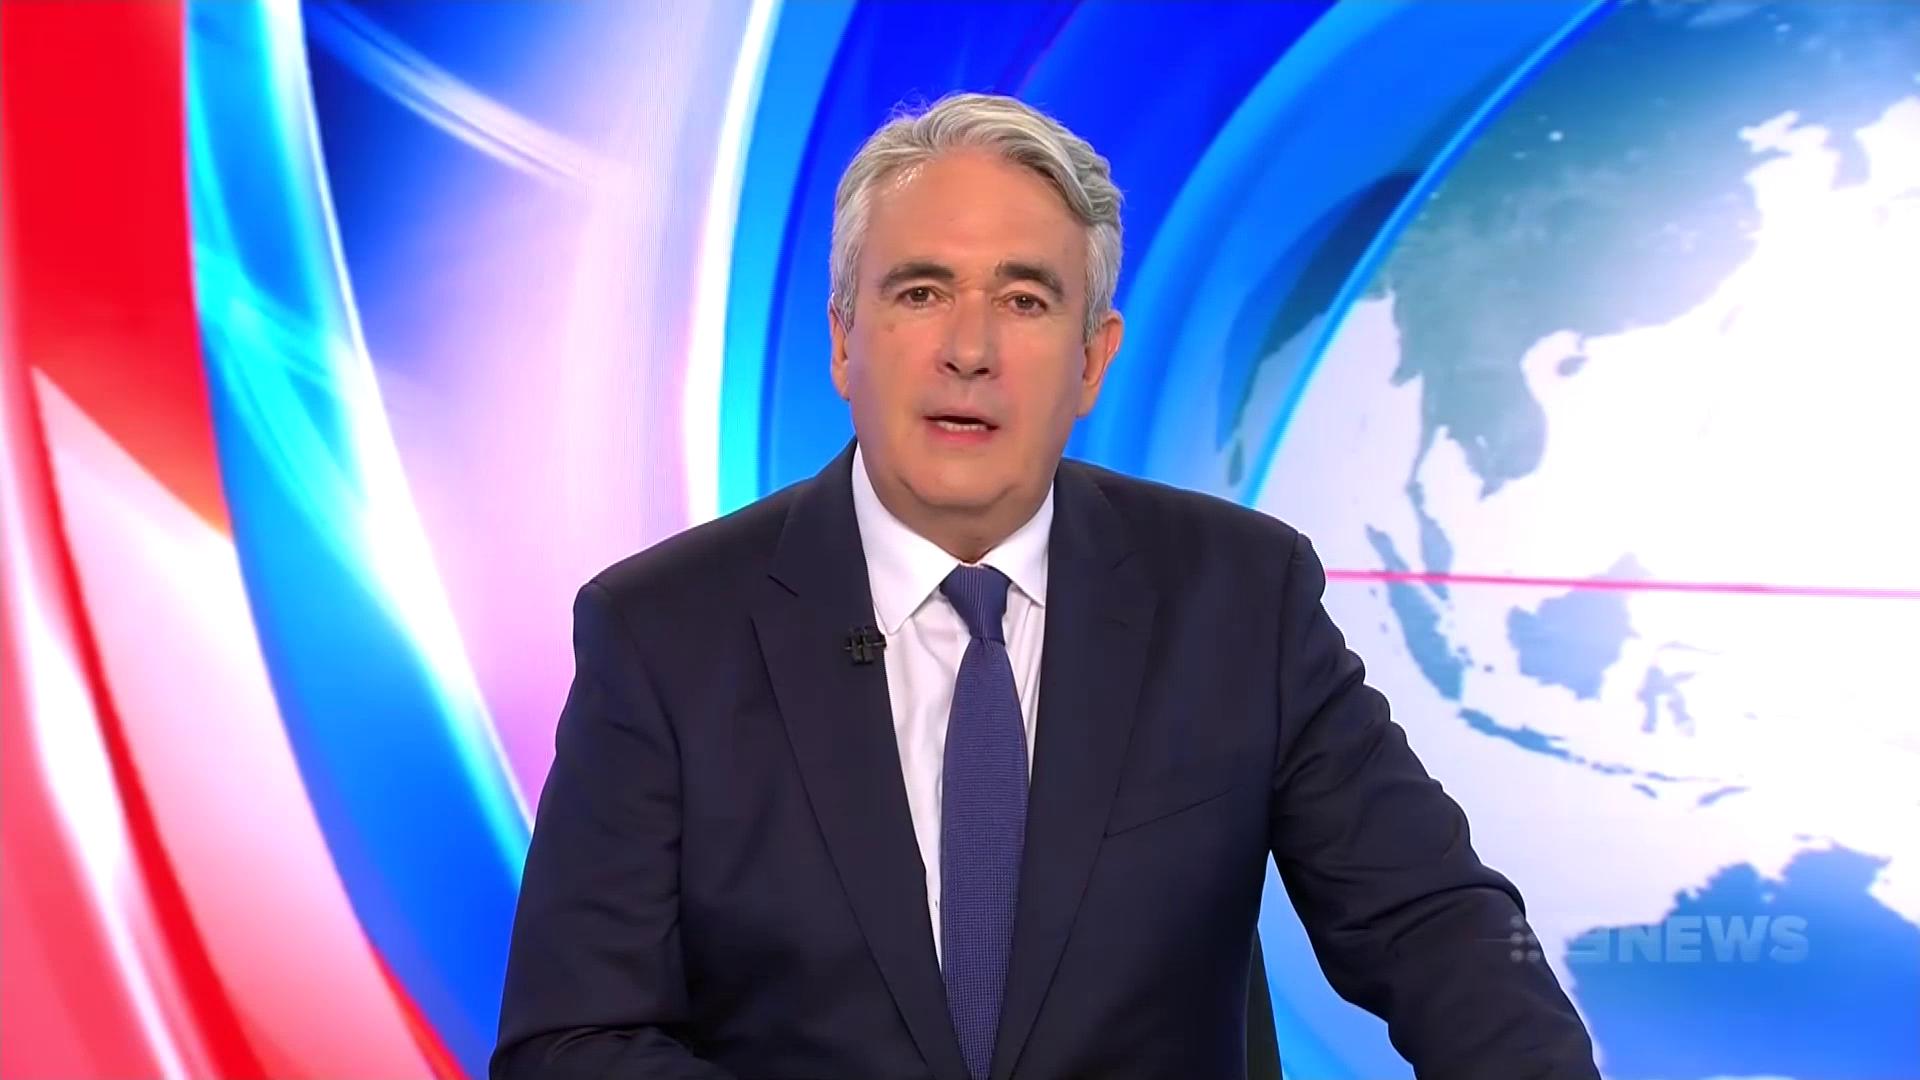 Mark Burrows hosting Nine's coverage   PHOTO: Screen capture via TV Blackbox